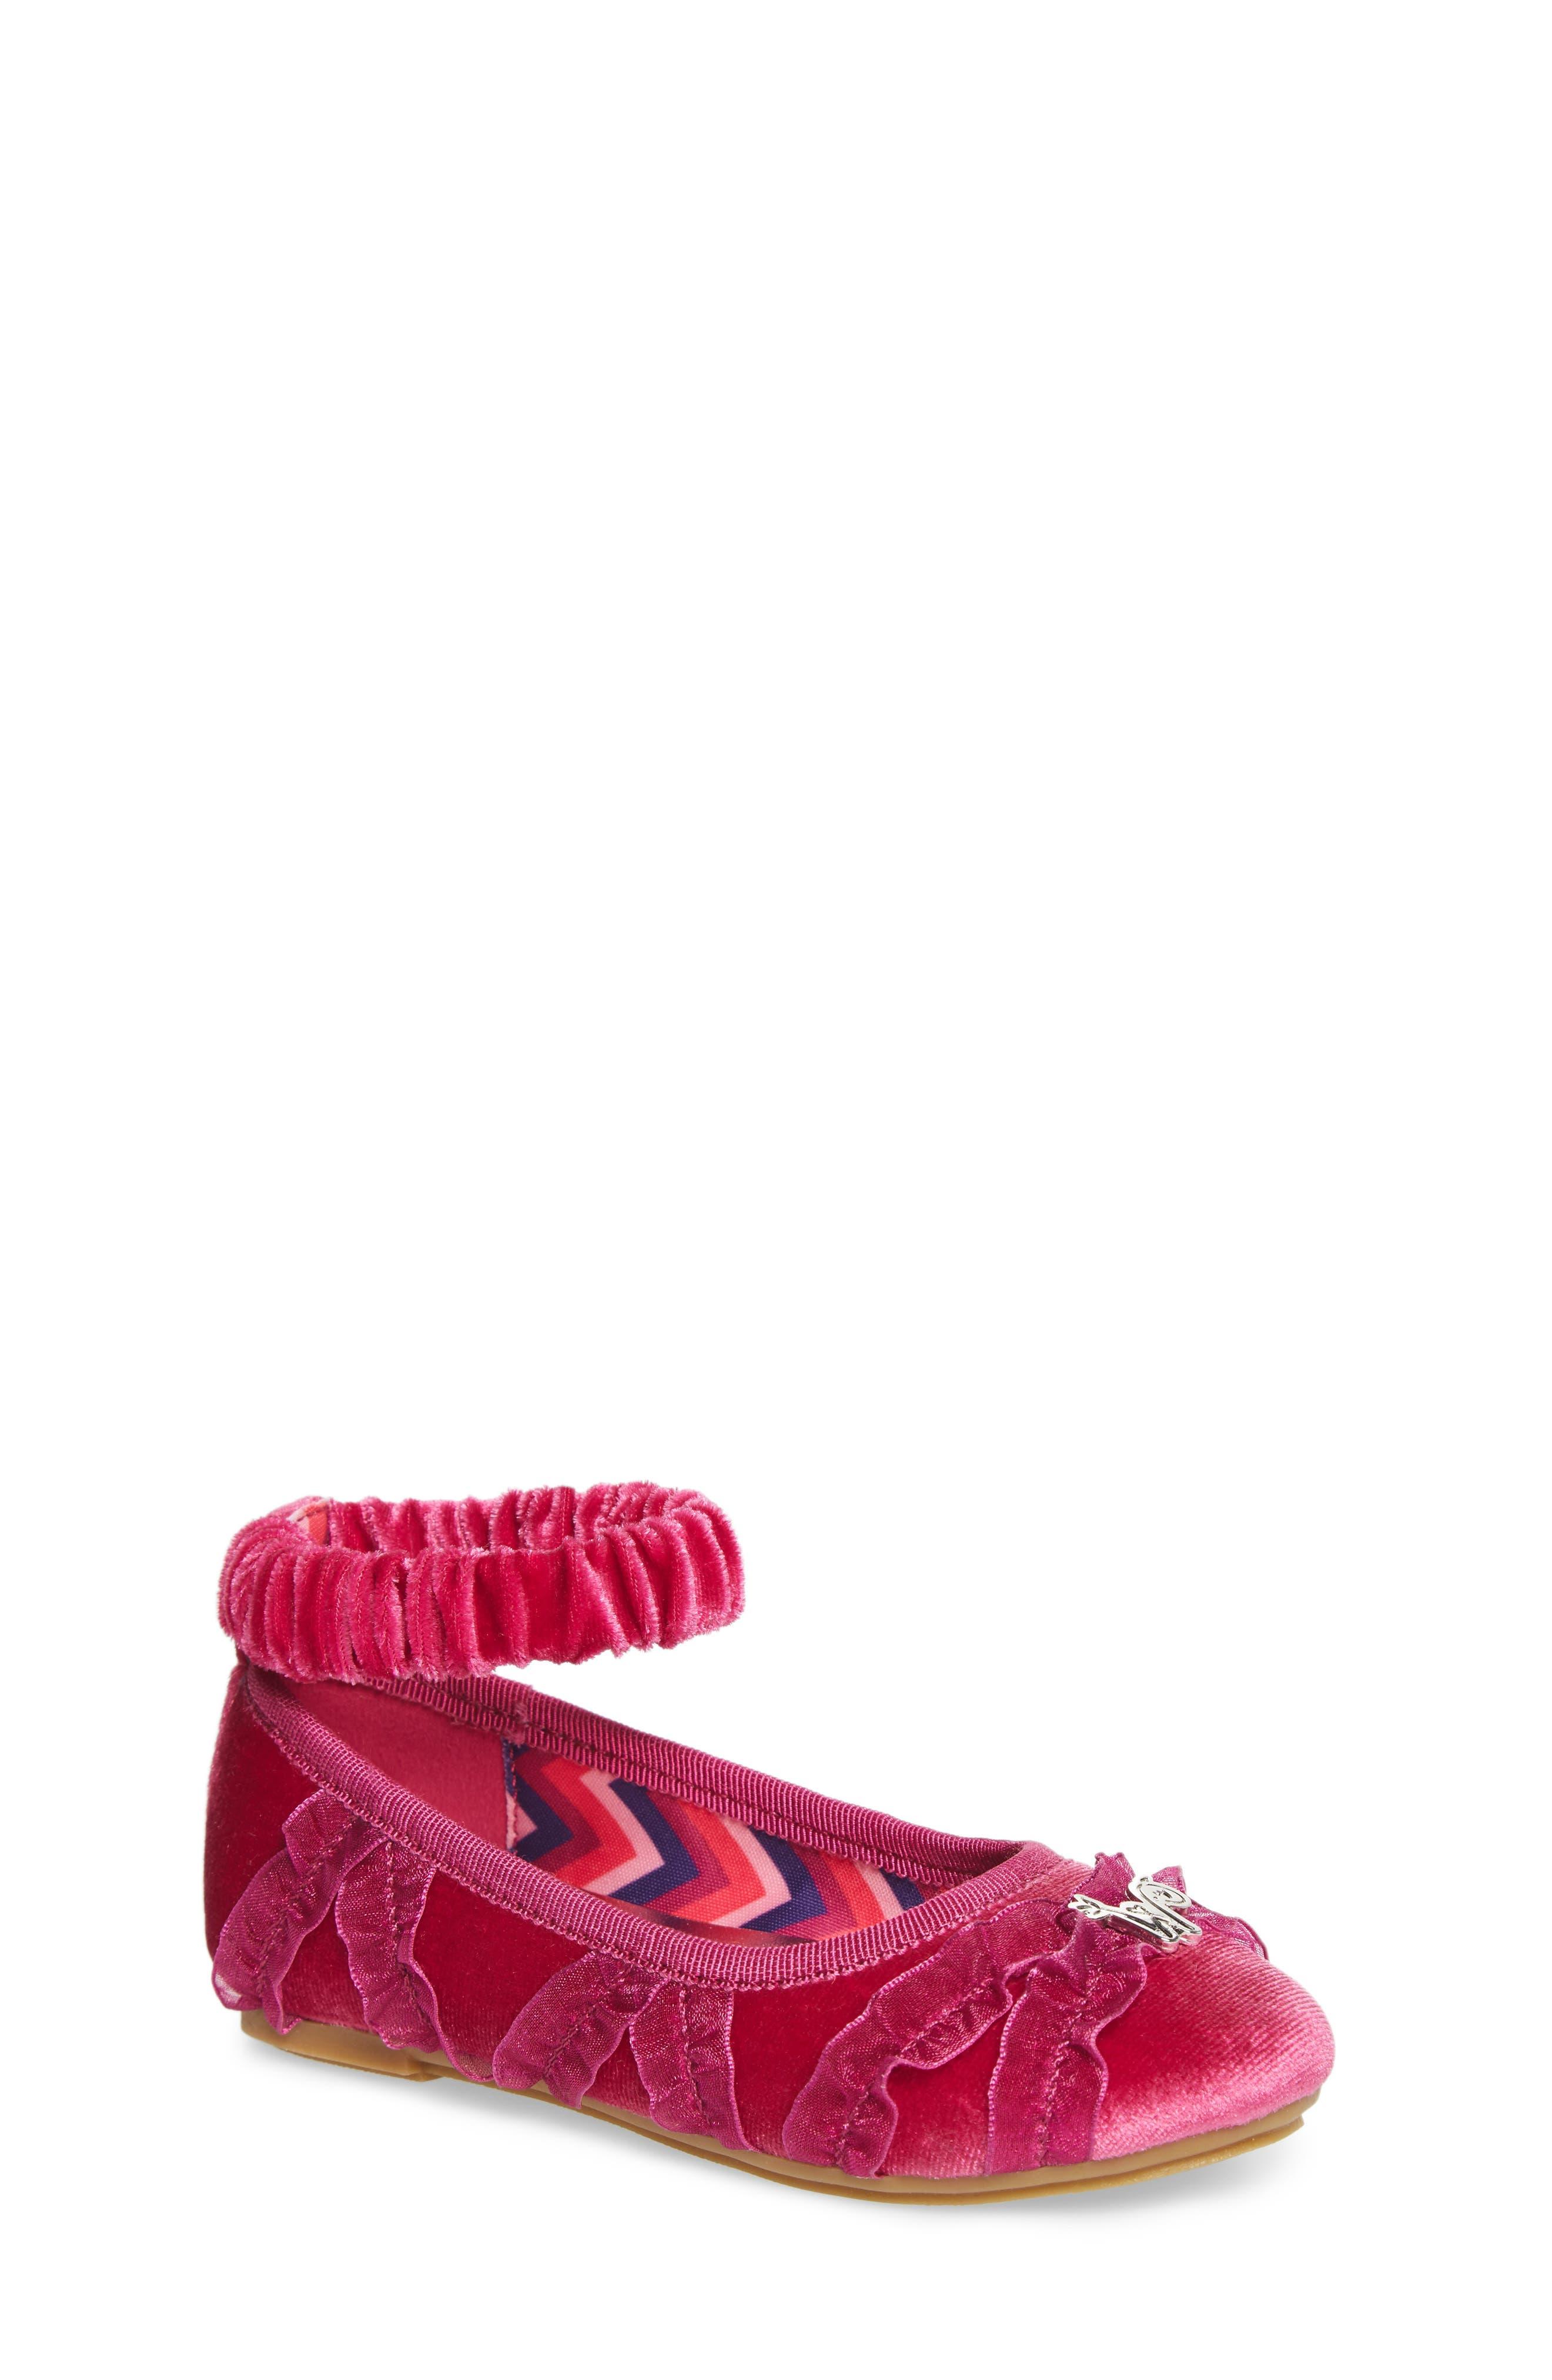 Emerson Ankle Strap Ballet Flat,                             Main thumbnail 1, color,